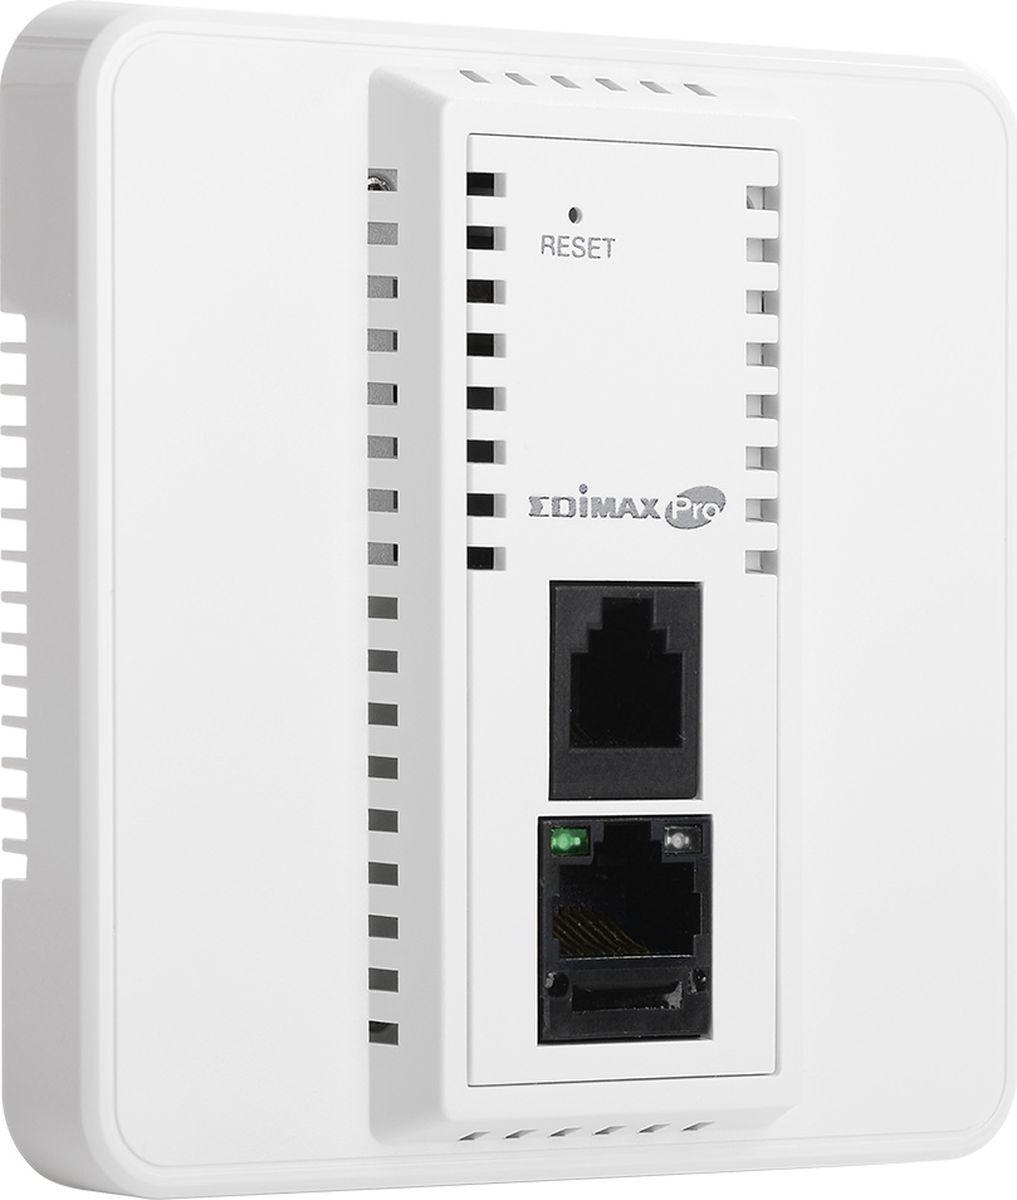 Edimax IAP1200 точка доступа